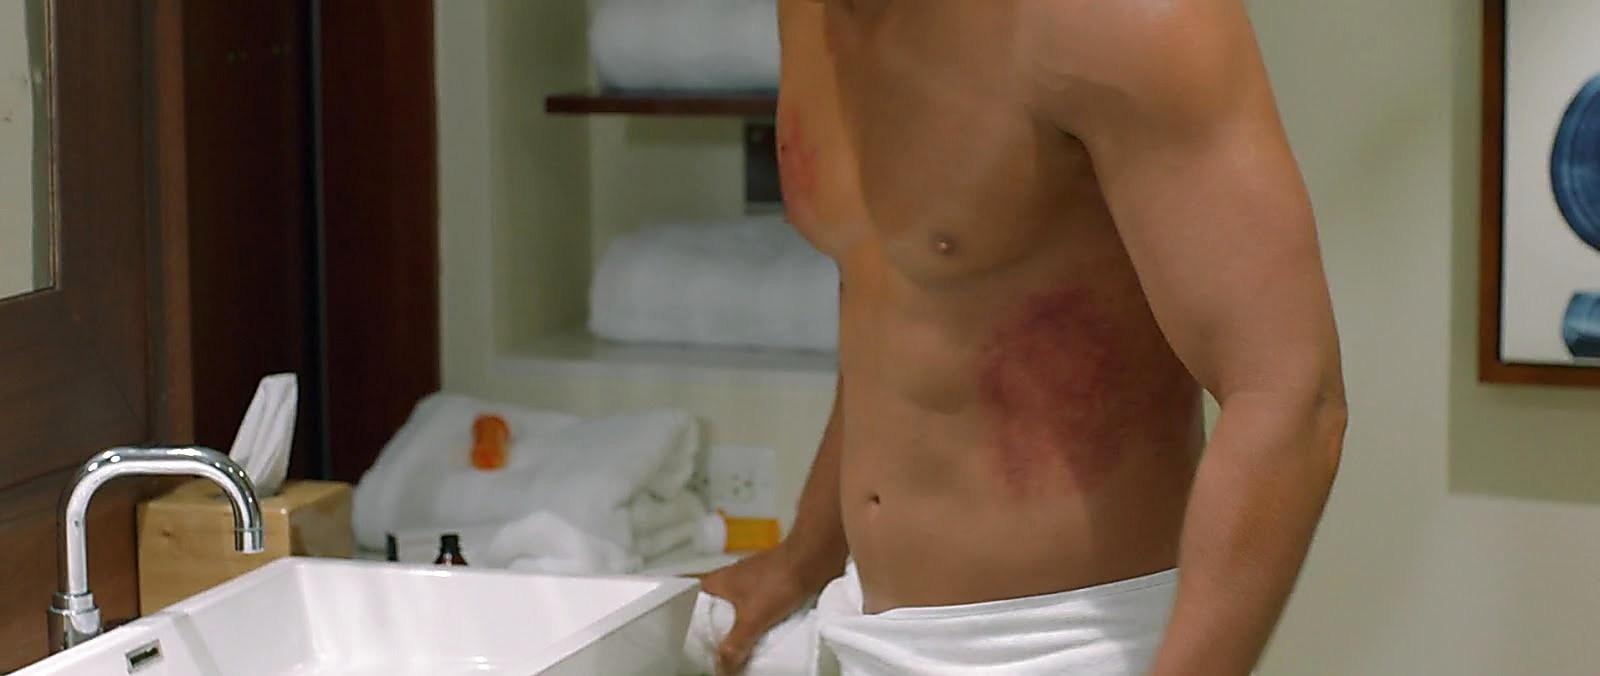 John Travolta sexy shirtless scene November 21, 2018, 12pm